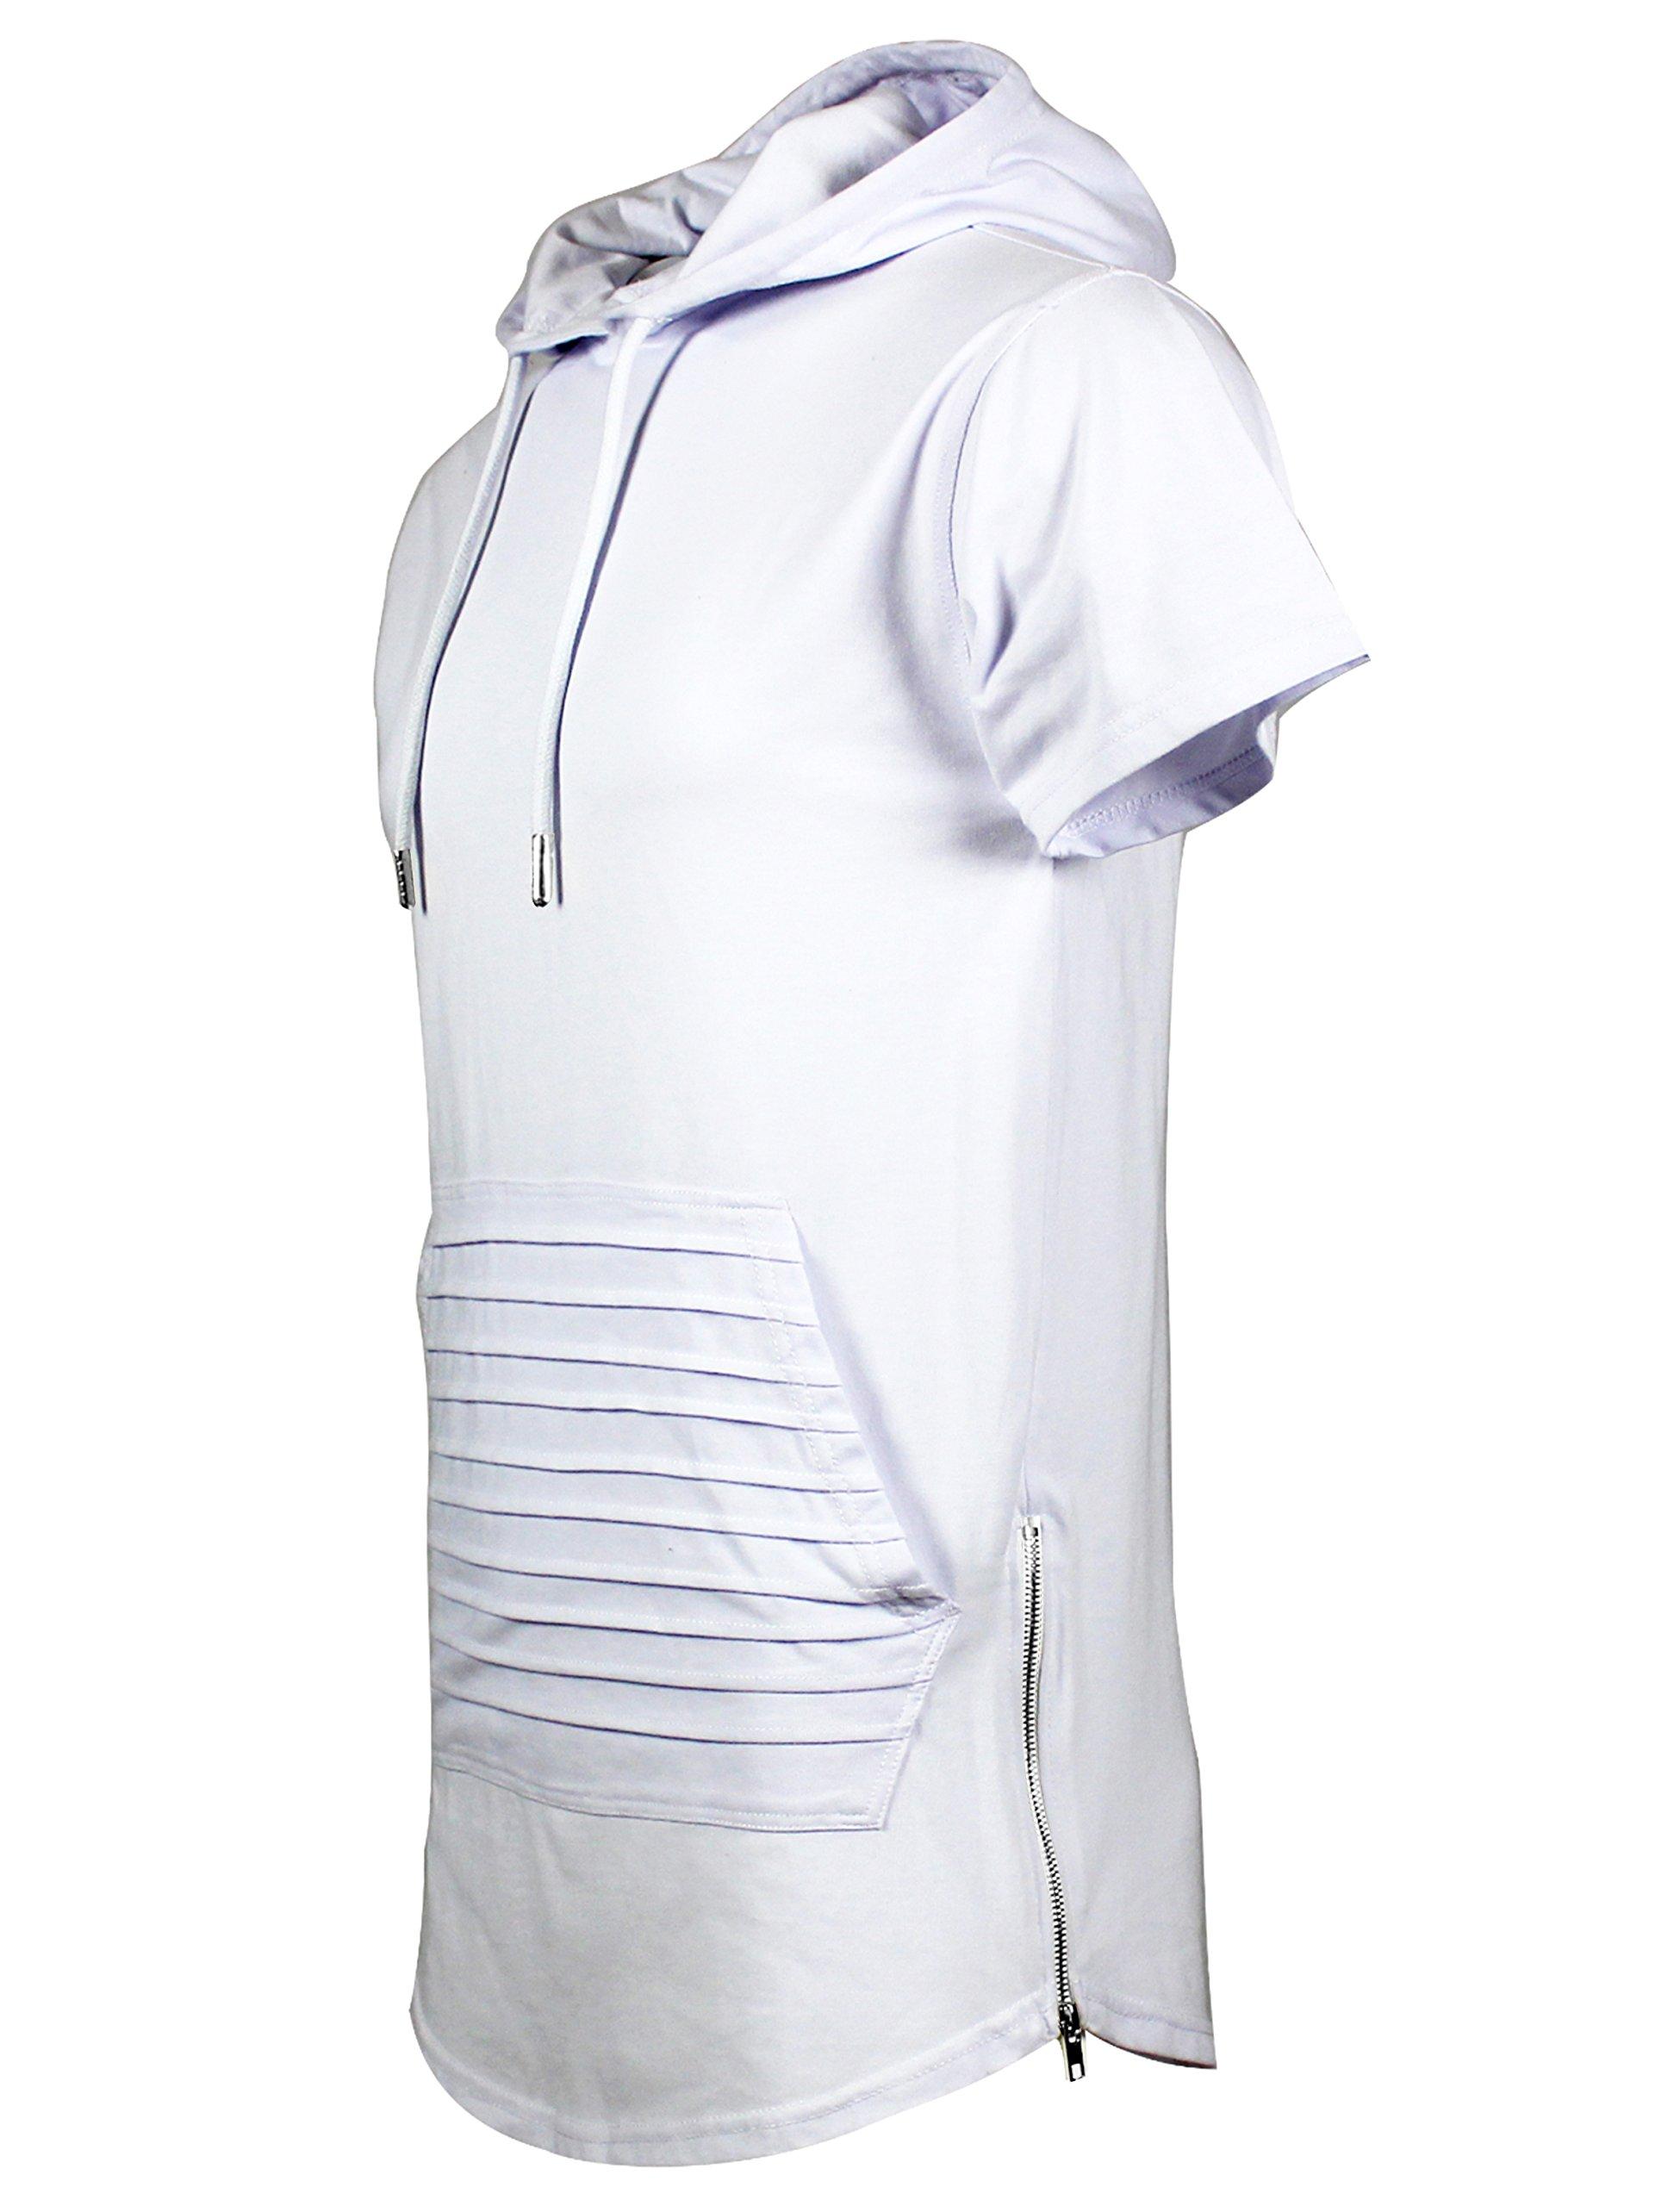 Screenshotbrand Mens Hip Hop Longline Premium Tee - Pullover Hooded Fashion T-Shirt w/Side Zipper Biker Trimmed Pocket - White - XLarge